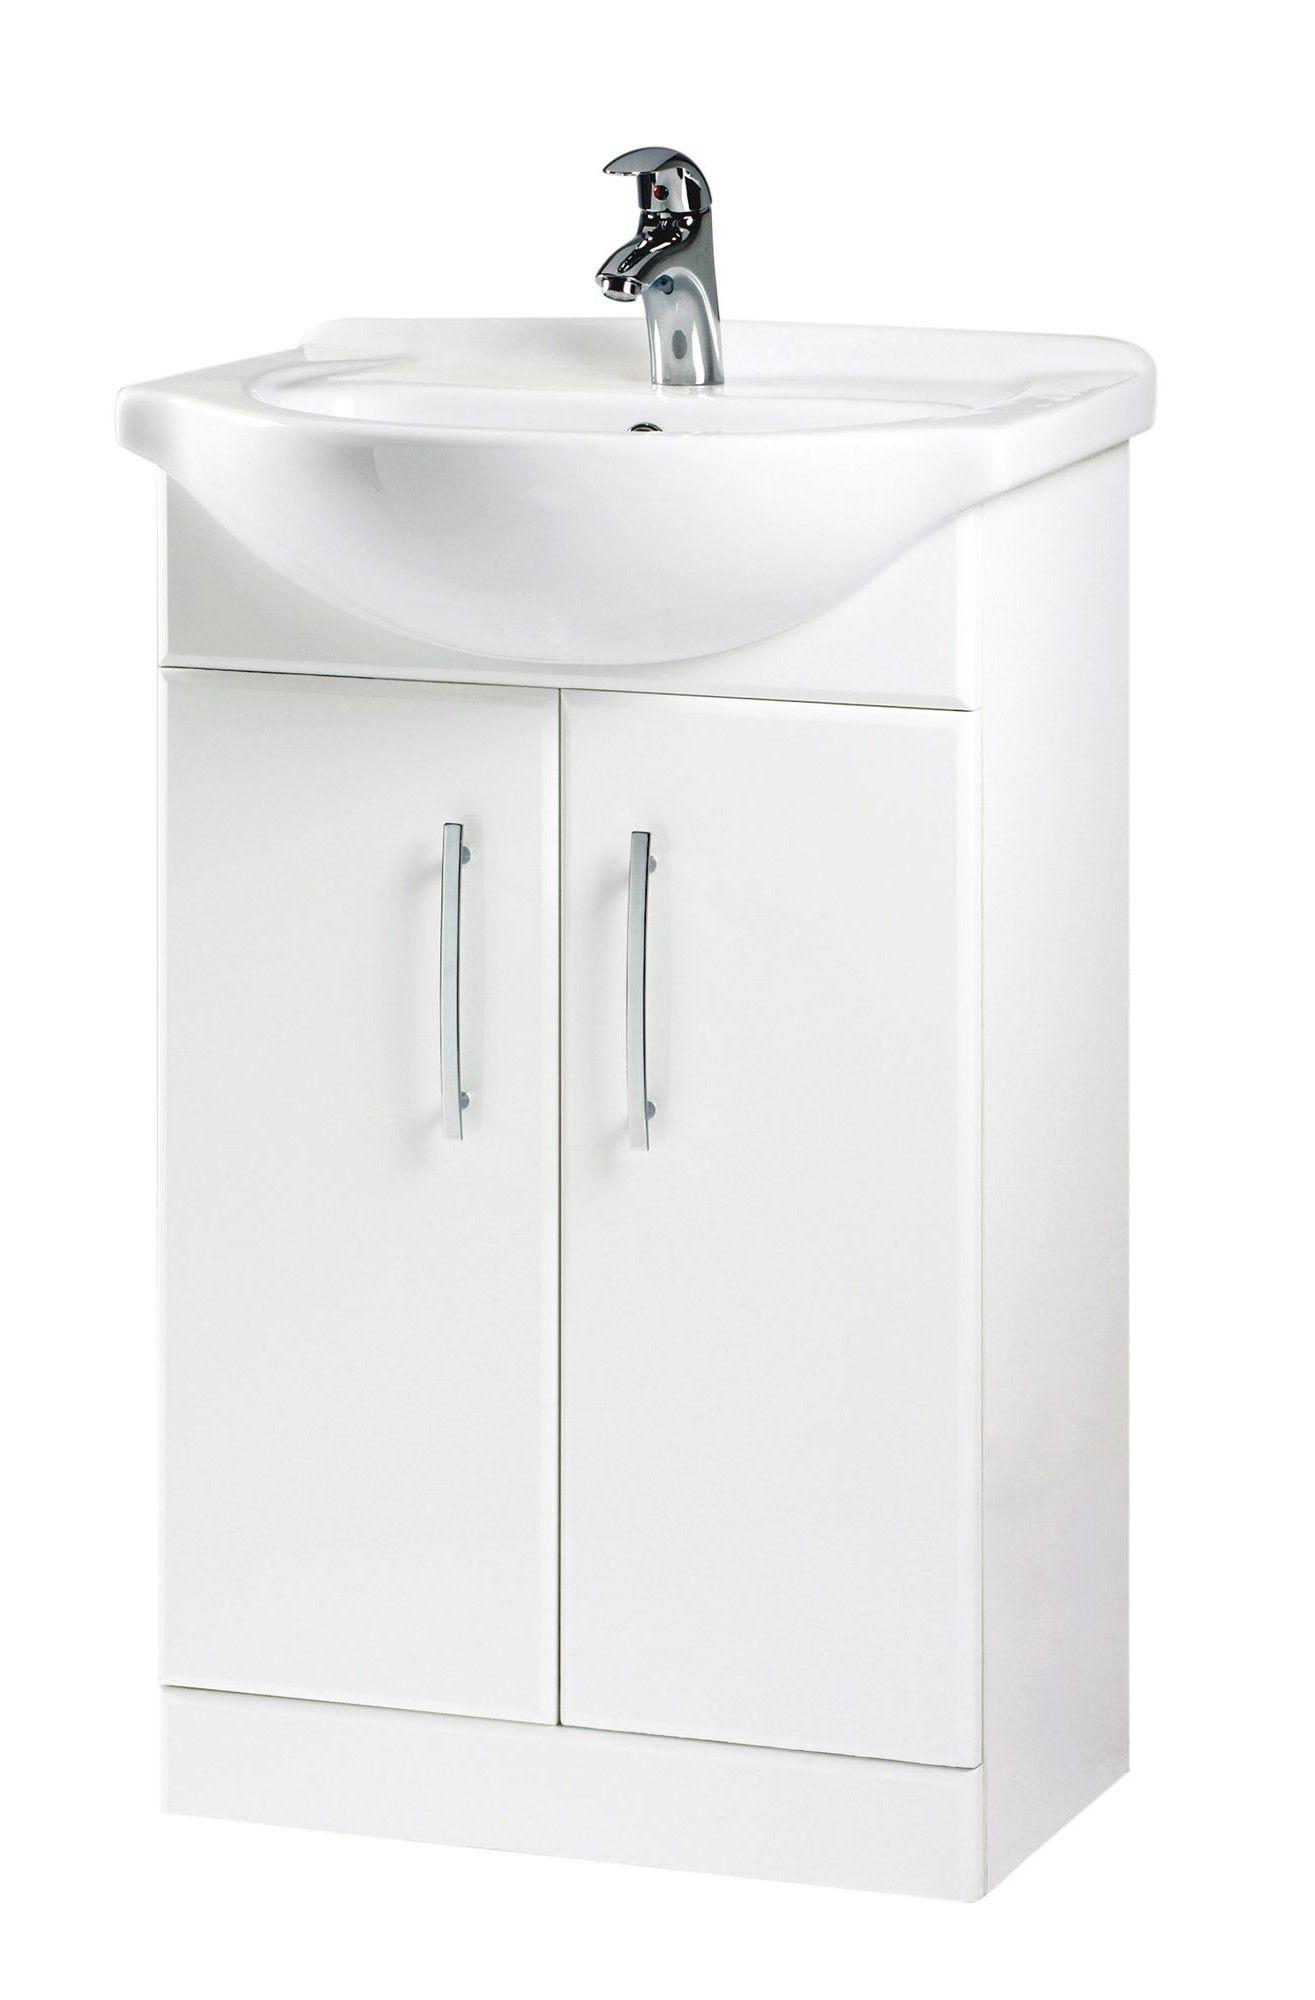 b q white vanity unit basin departments diy at b q from bq bathroom storage units - Bathroom Cabinets B Q